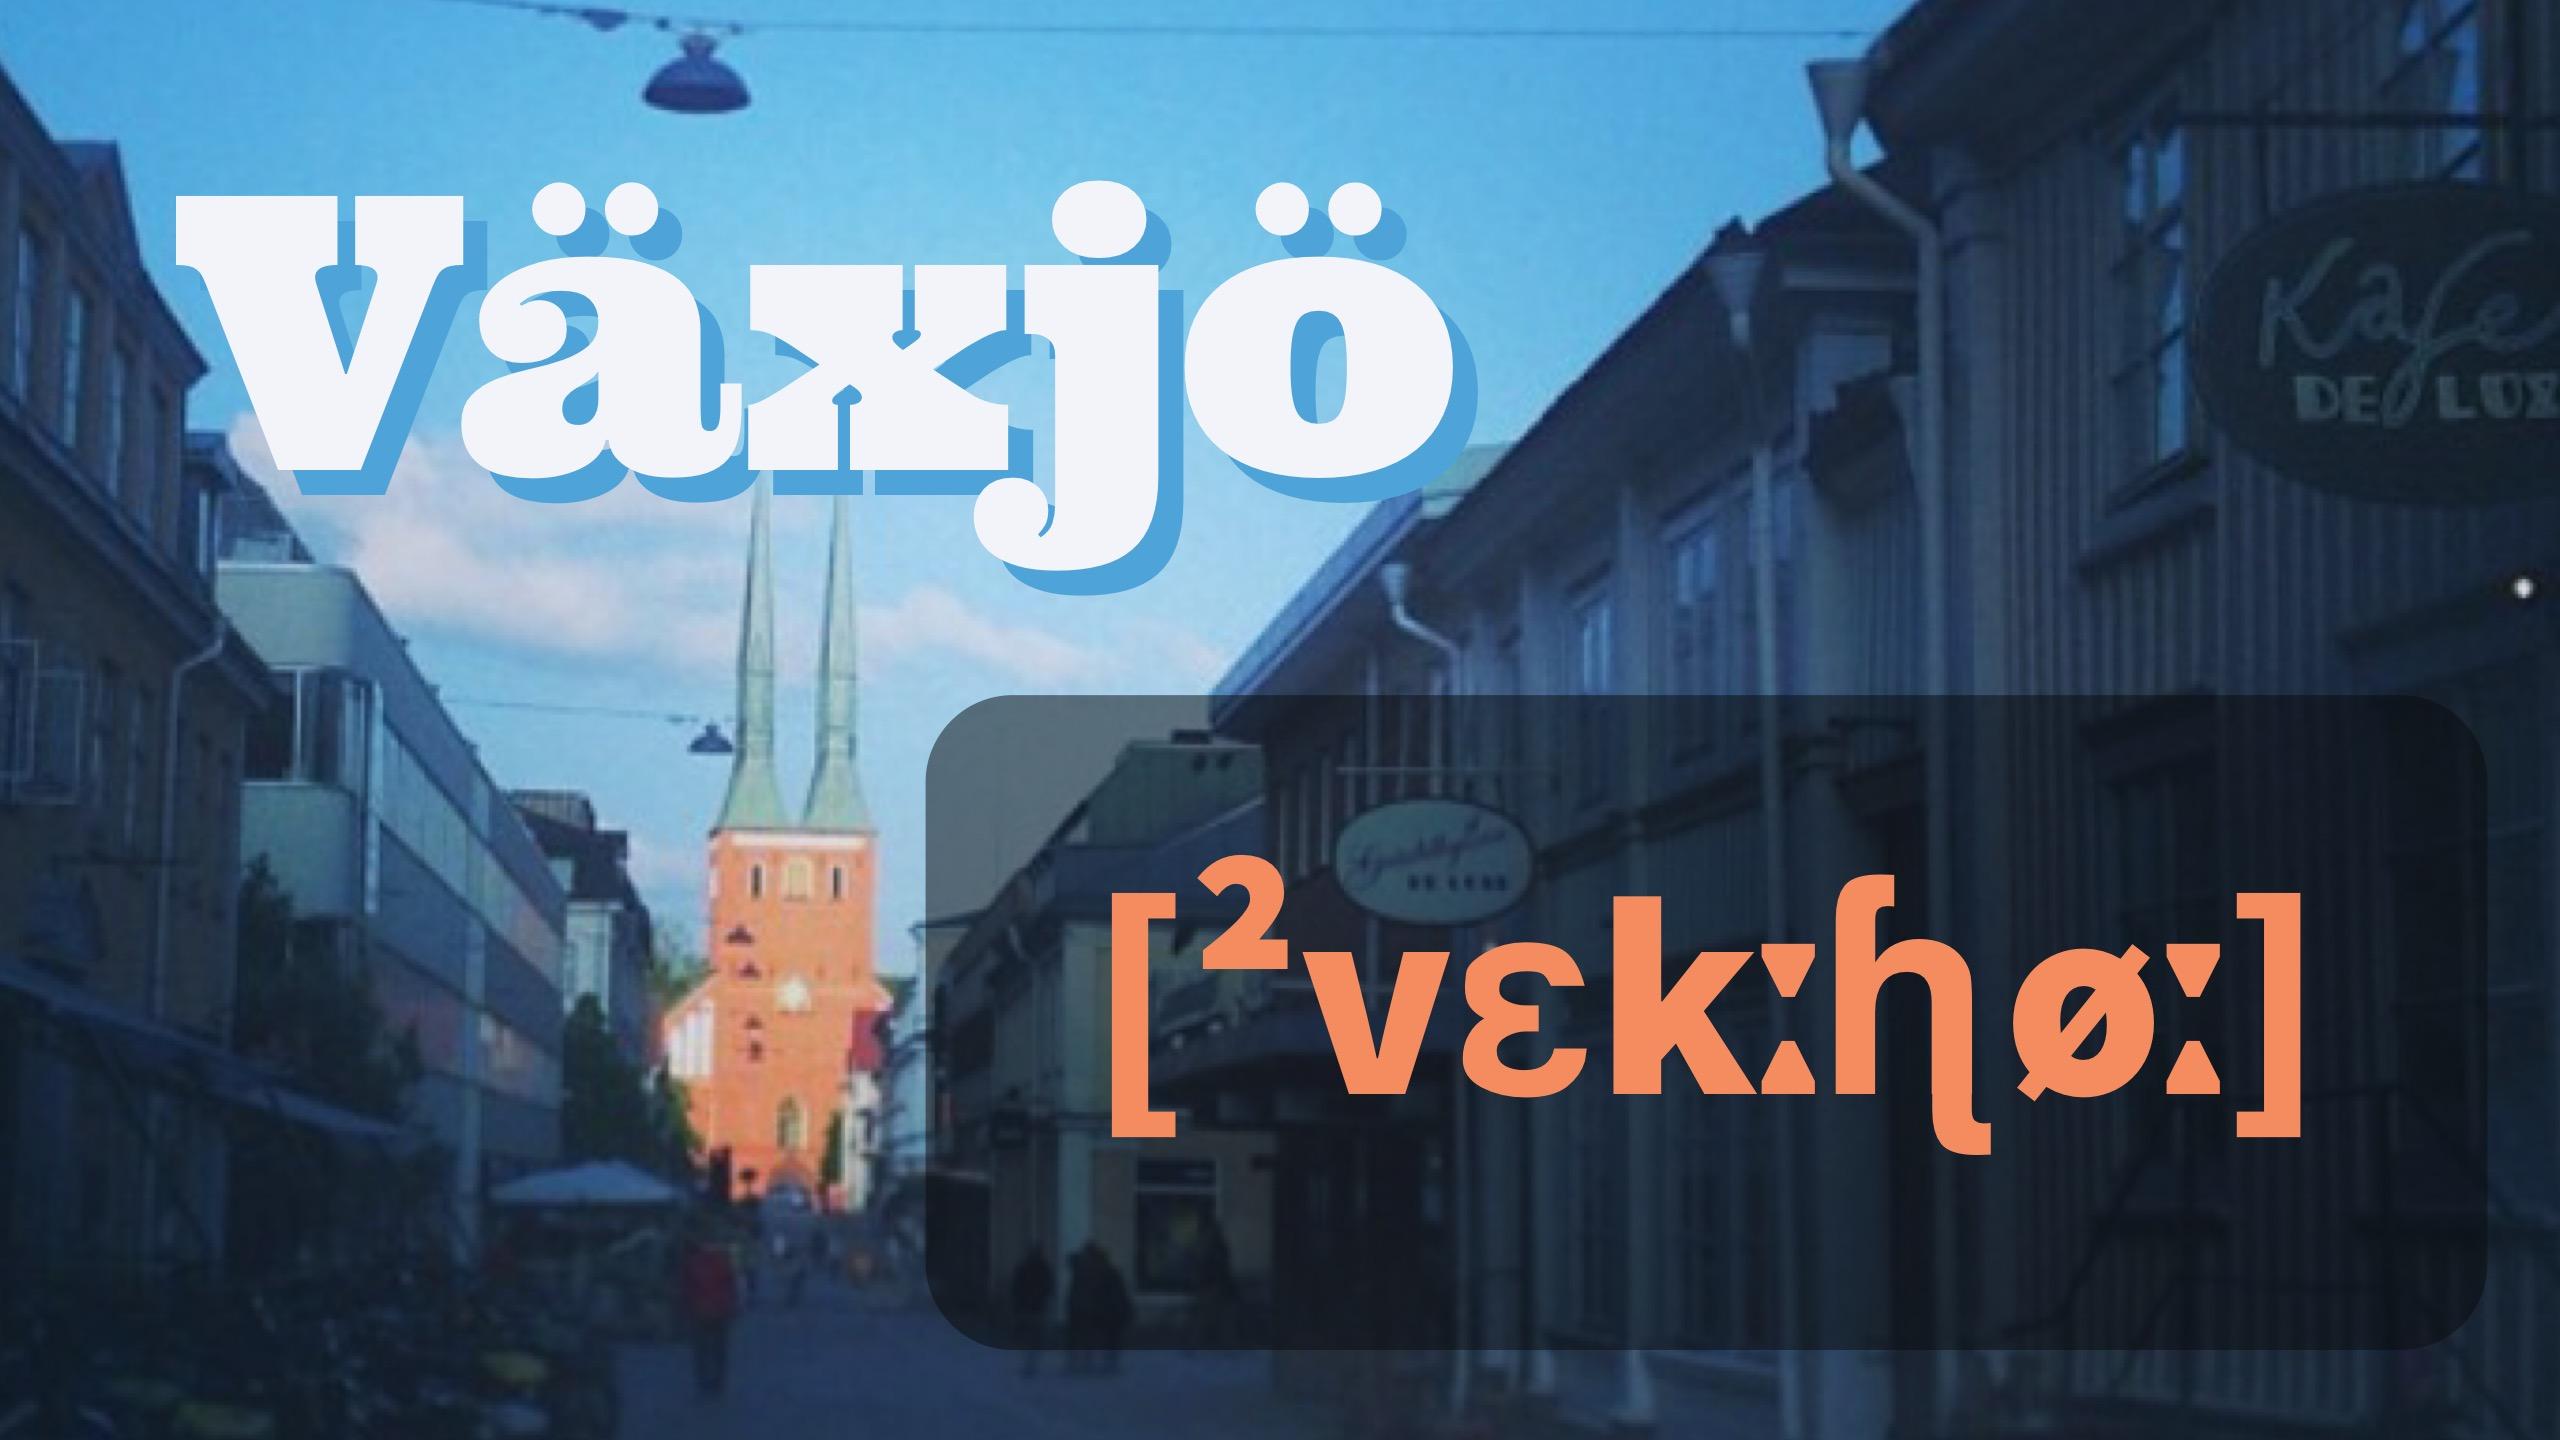 Translation & pronunciation of